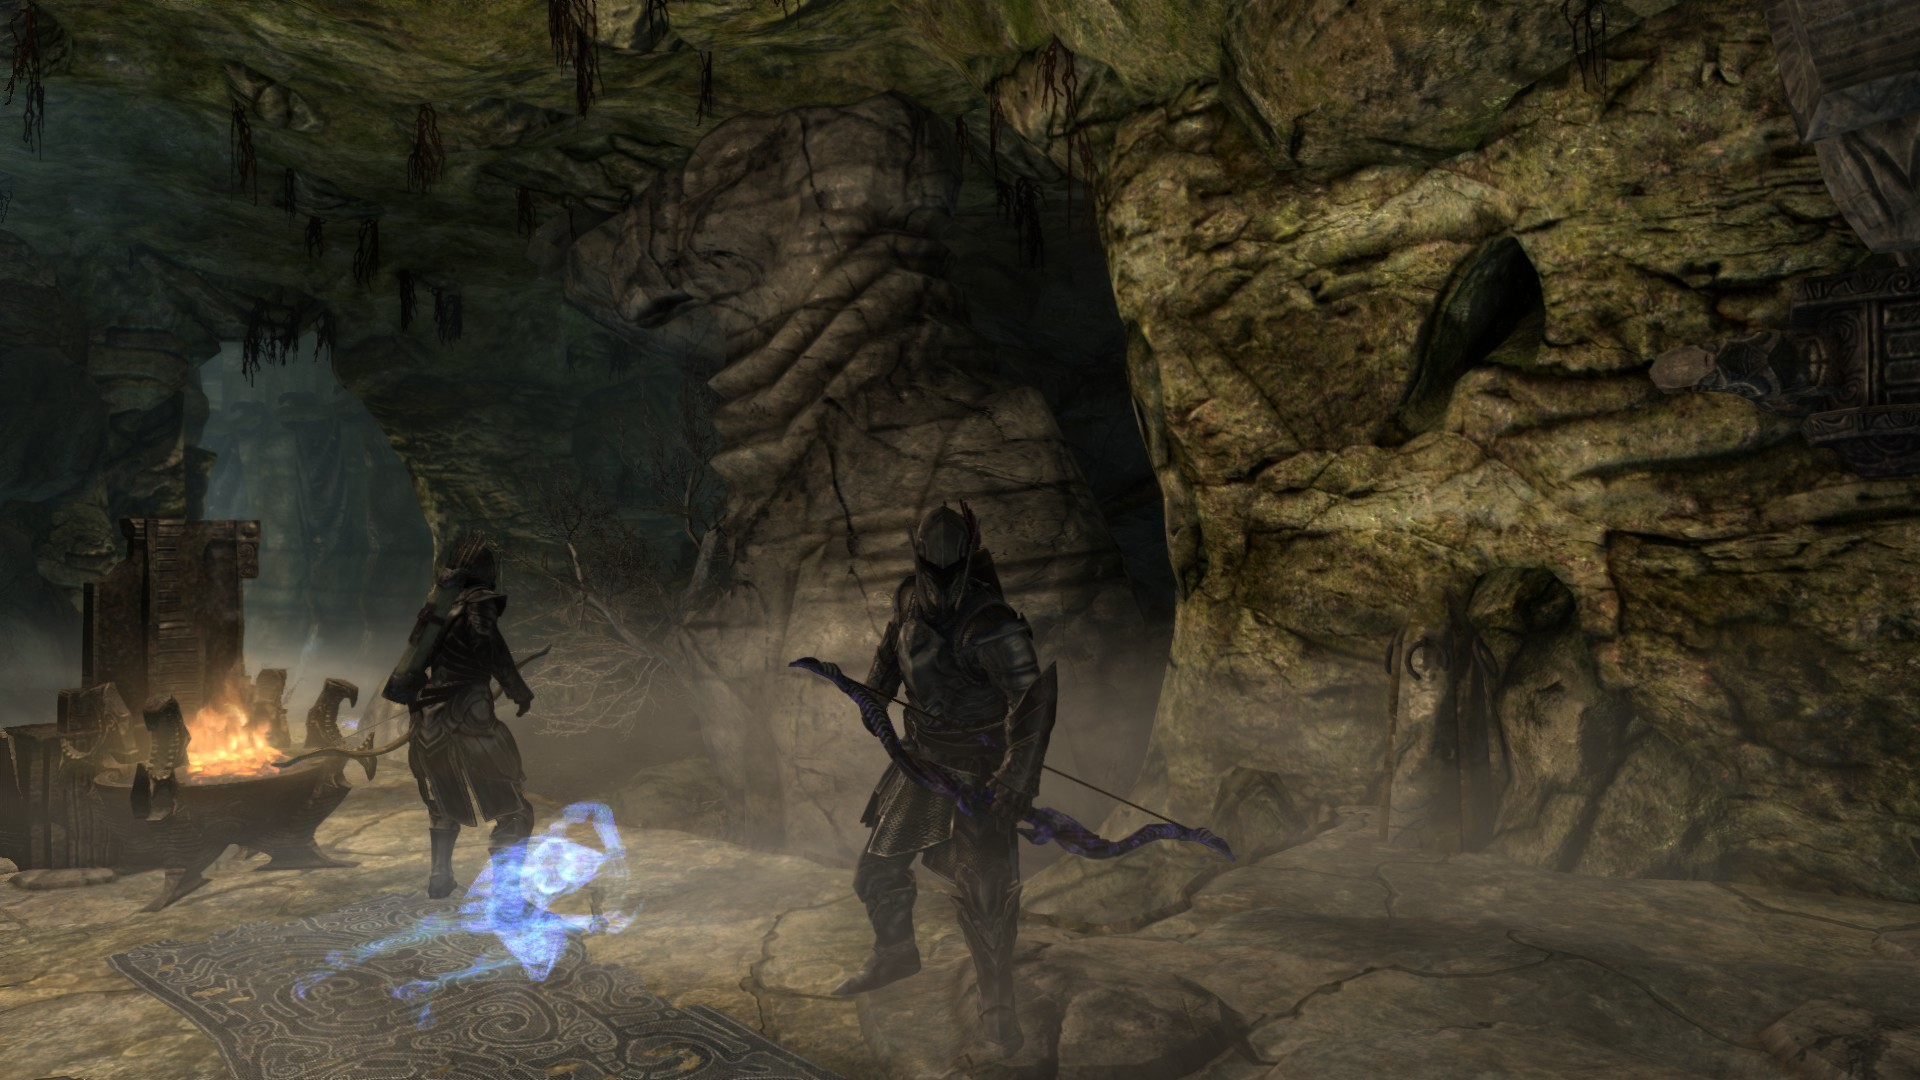 20180611144300_1.jpg - Elder Scrolls 5: Skyrim, the